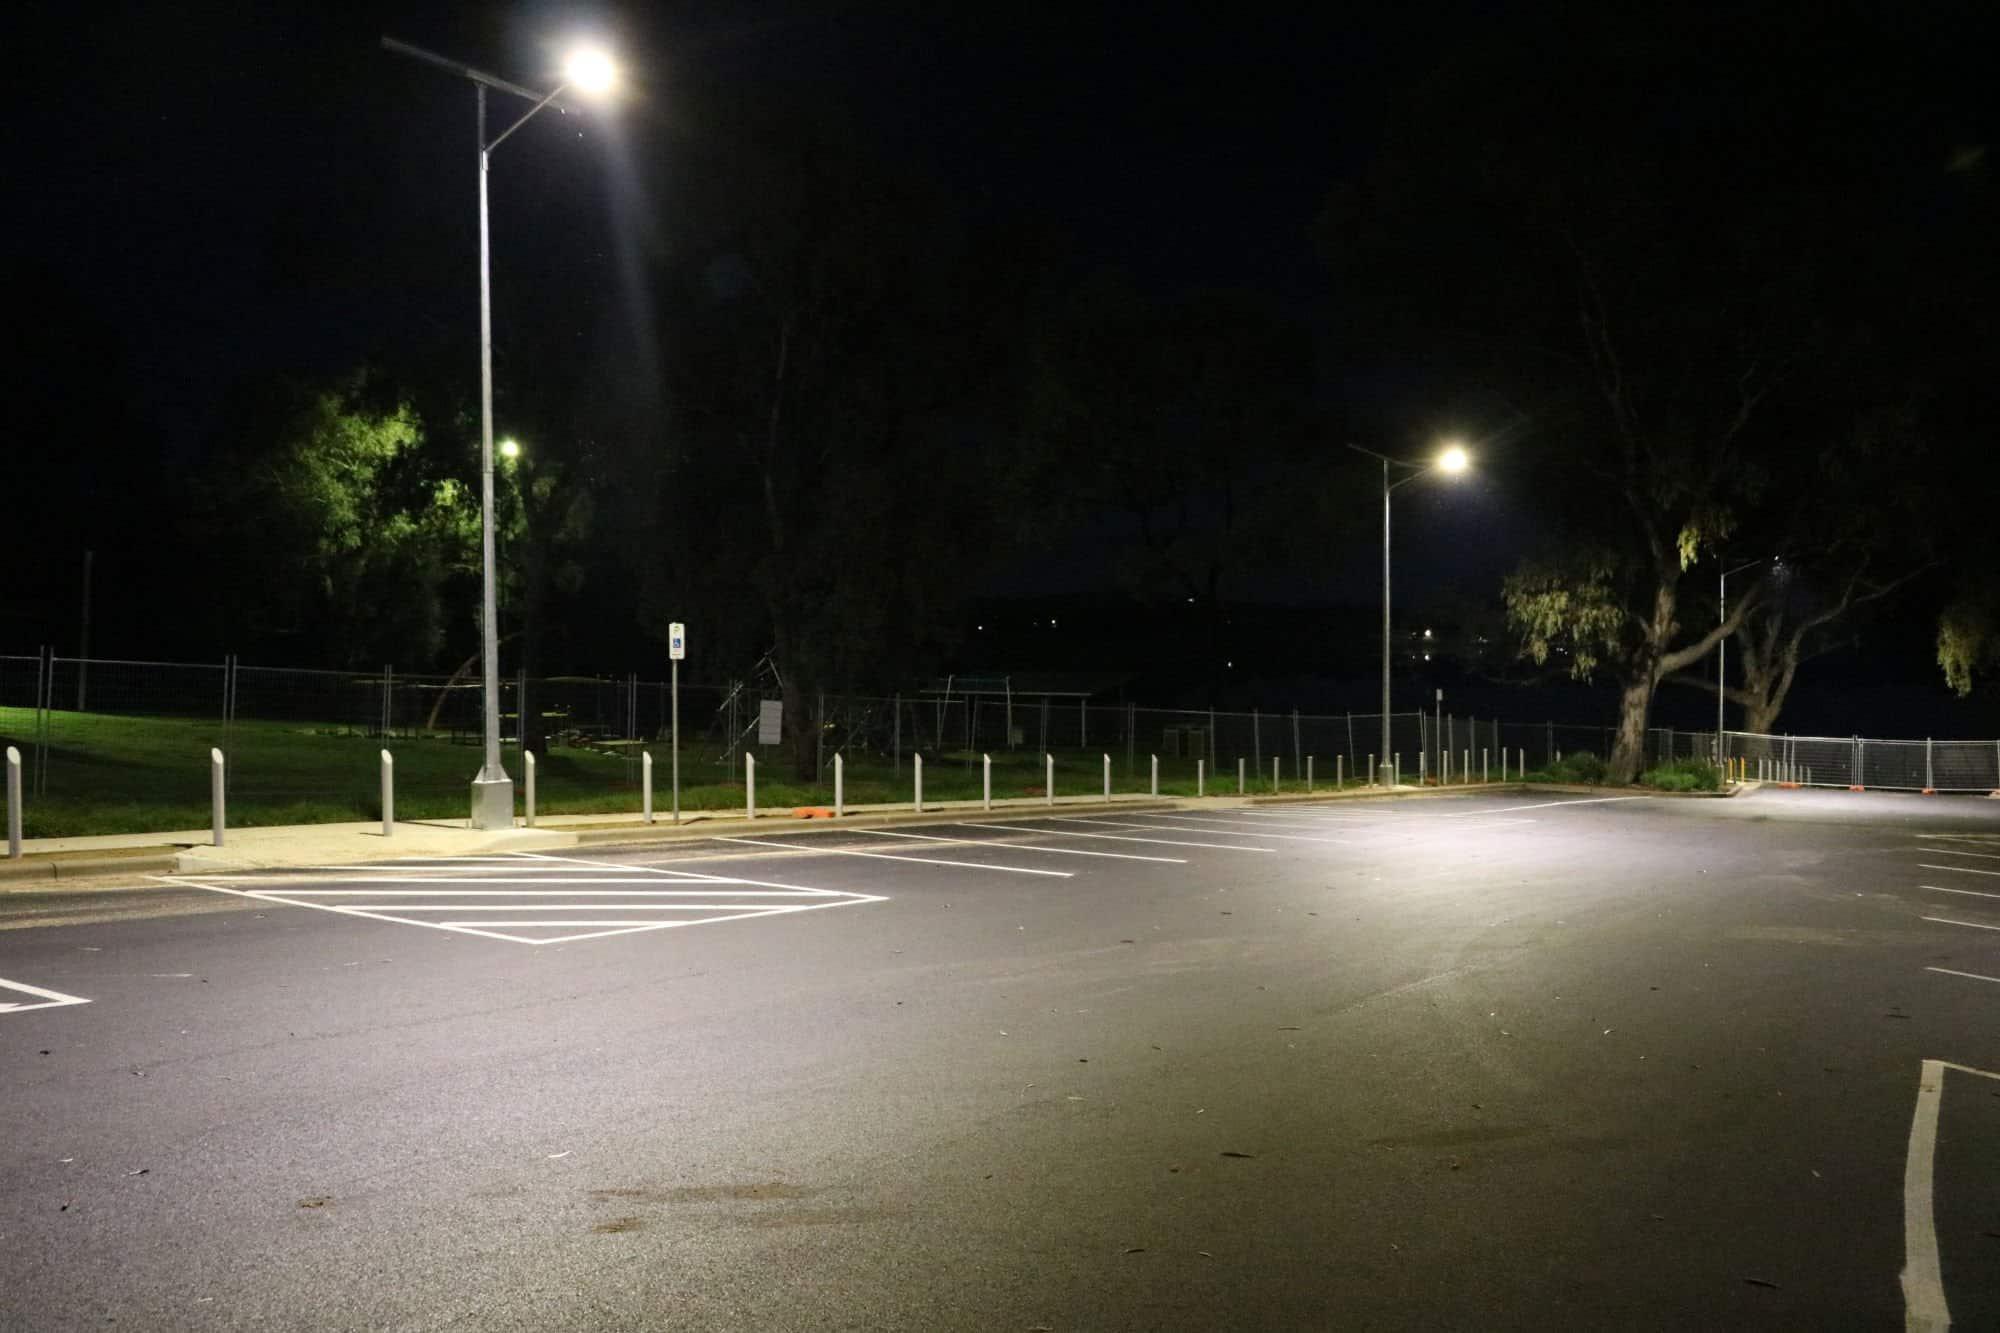 Ufo Led Light